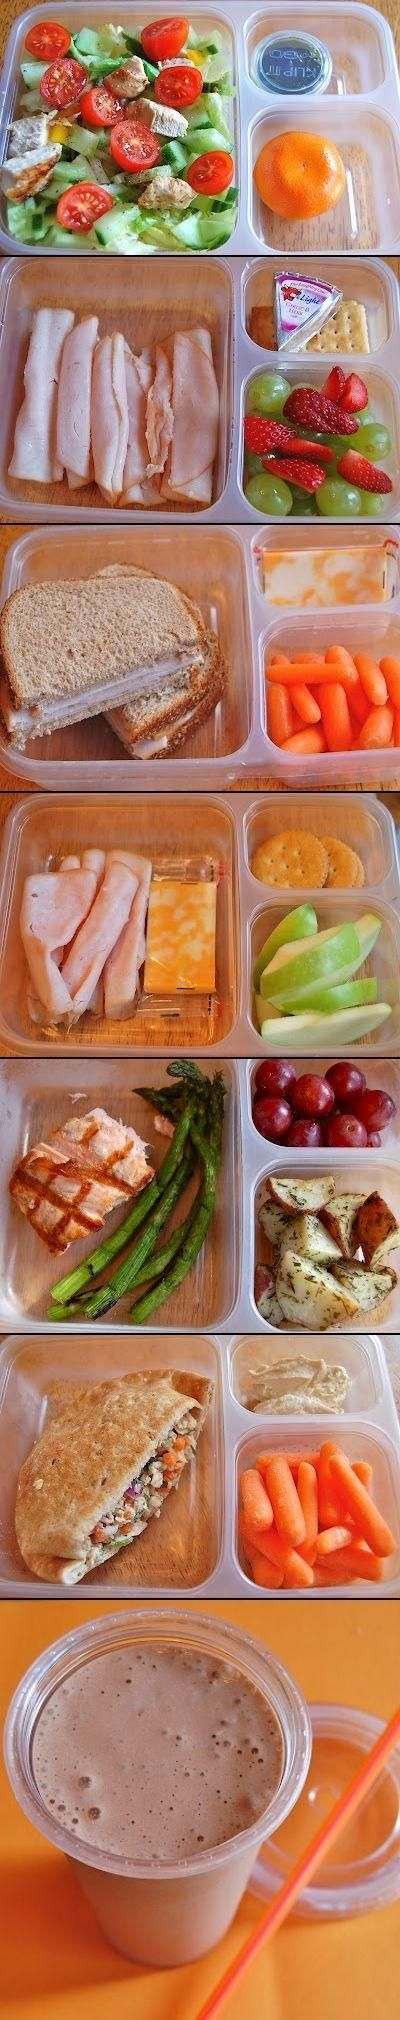 Lunchspiration